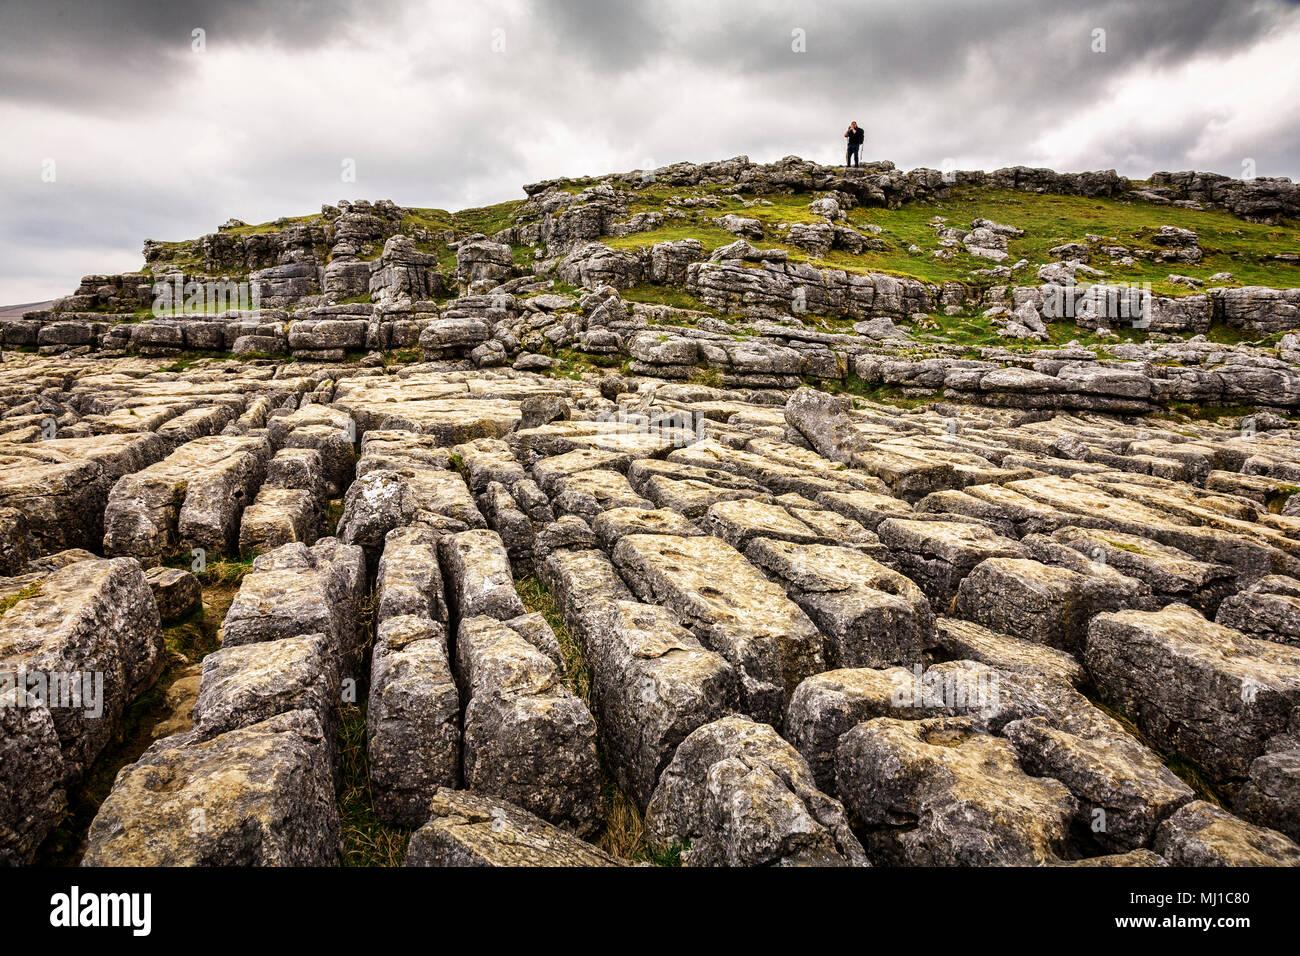 Karst calcaire chaussée à Malham Cove, Yorkshire Dales, Angleterre. Photo Stock